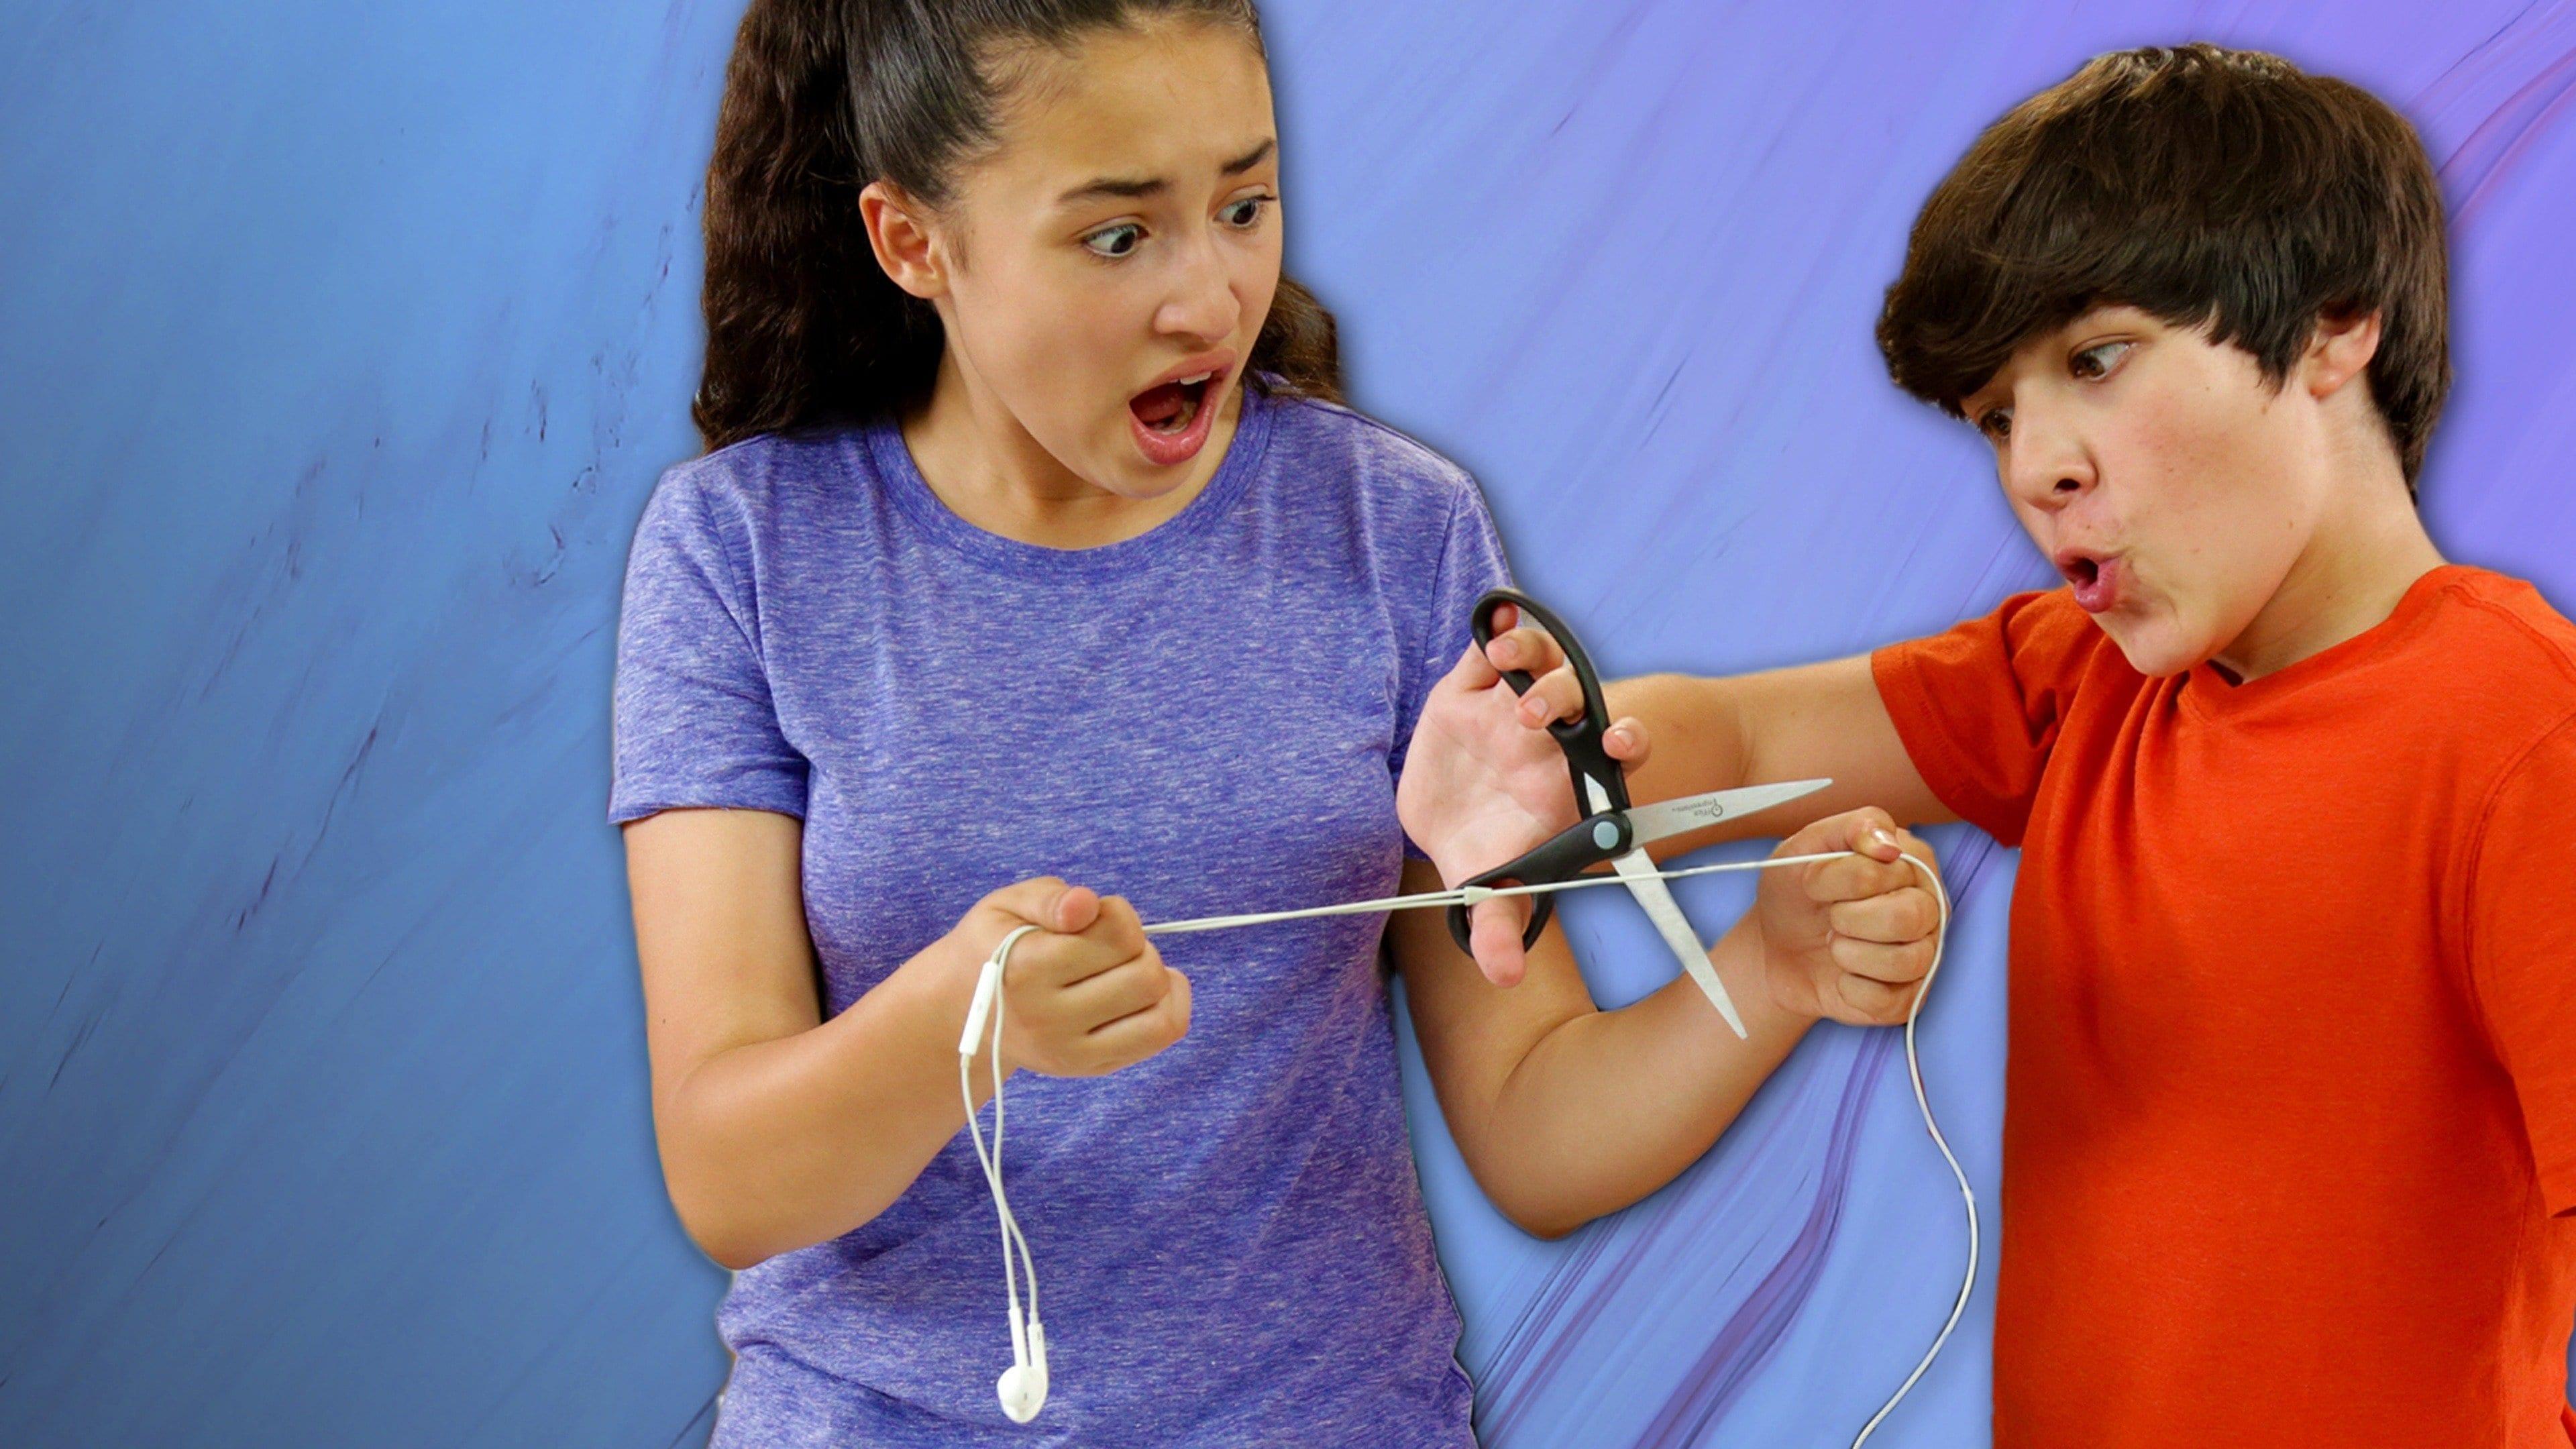 Cutting Headphones in Half Trick